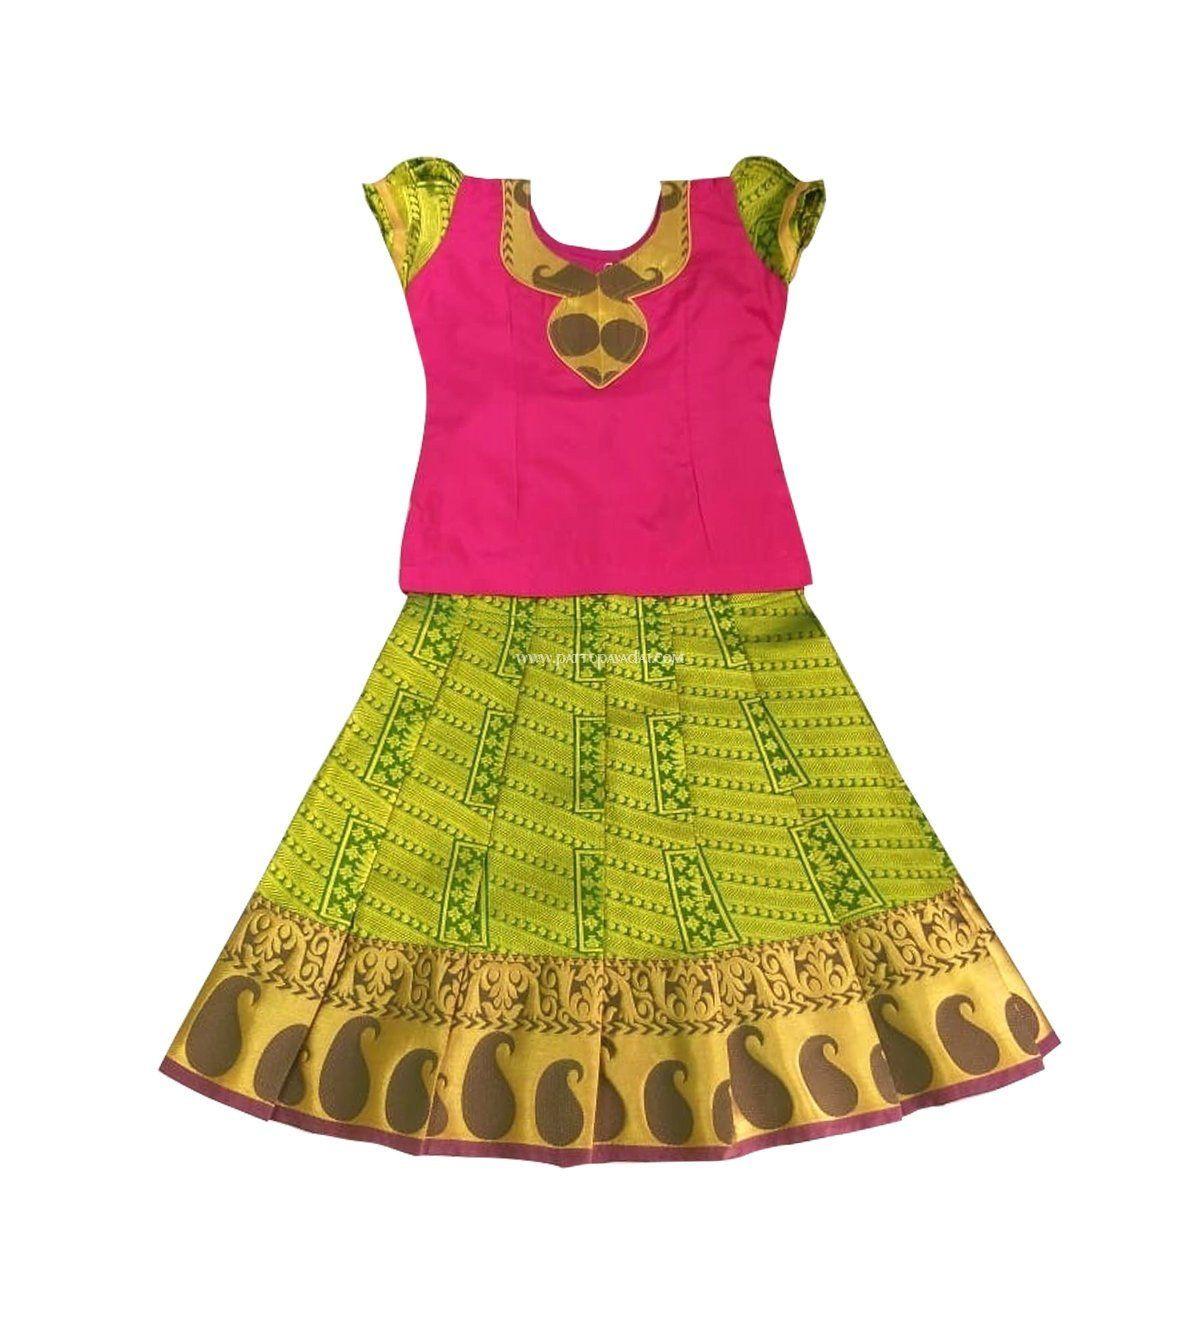 b7895d5c6f8ff Pattu Pavadai Baby Girl's / Kids Pure Silk (Green and Pink; 6 Months - 10  Years) #pattupavadai #lehengacholi #kidsdress #childrendress #babygirldress  ...